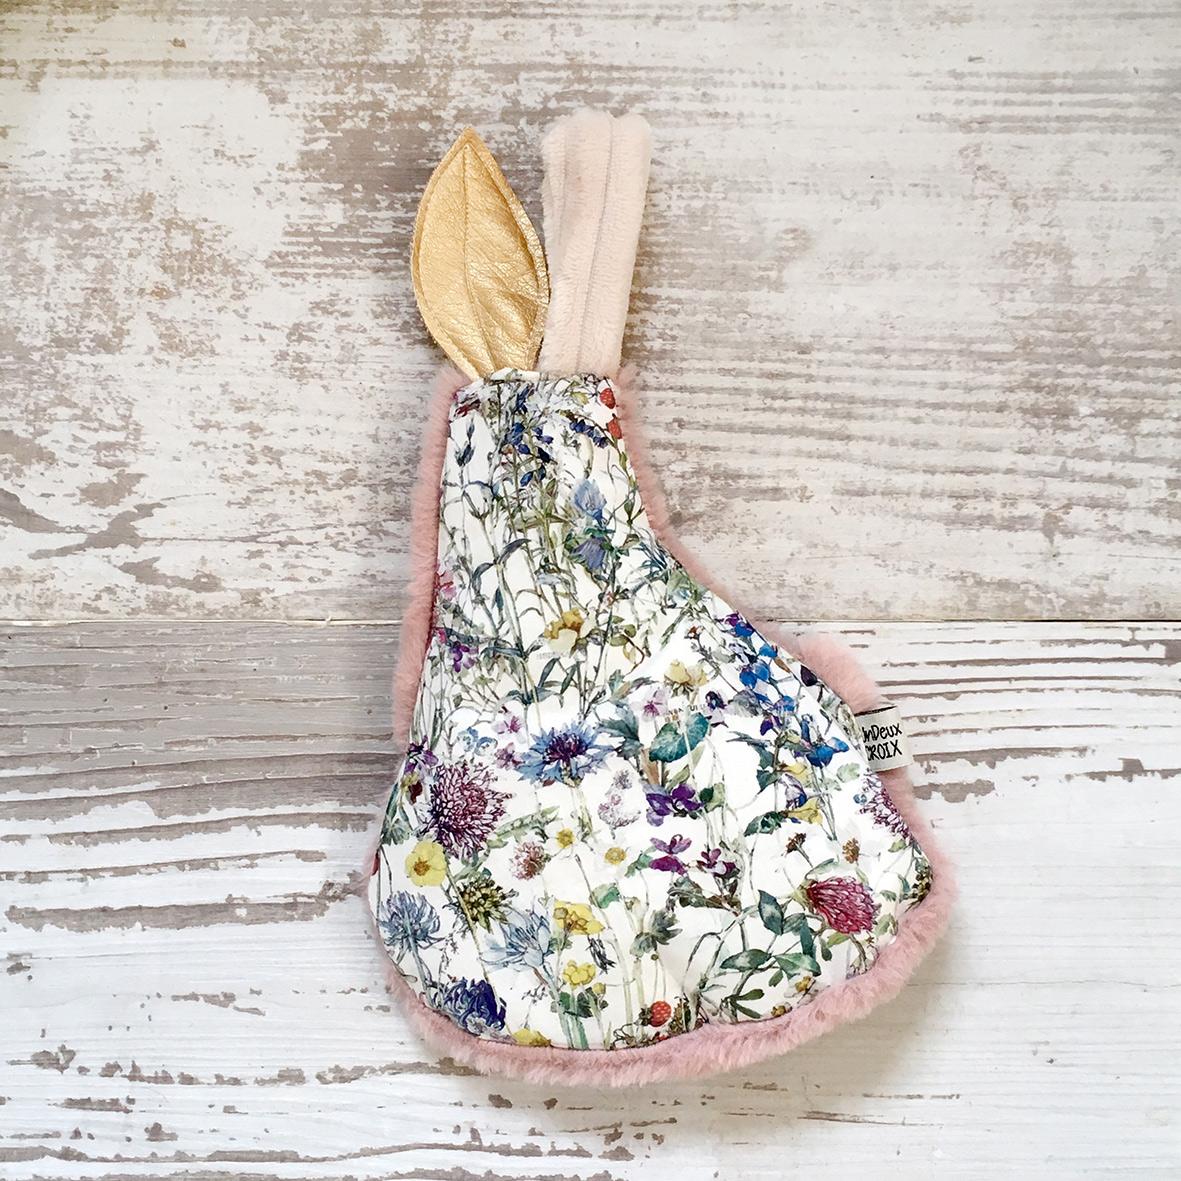 BOUILLOTTE SECHE - POIRE liberty wild flowers